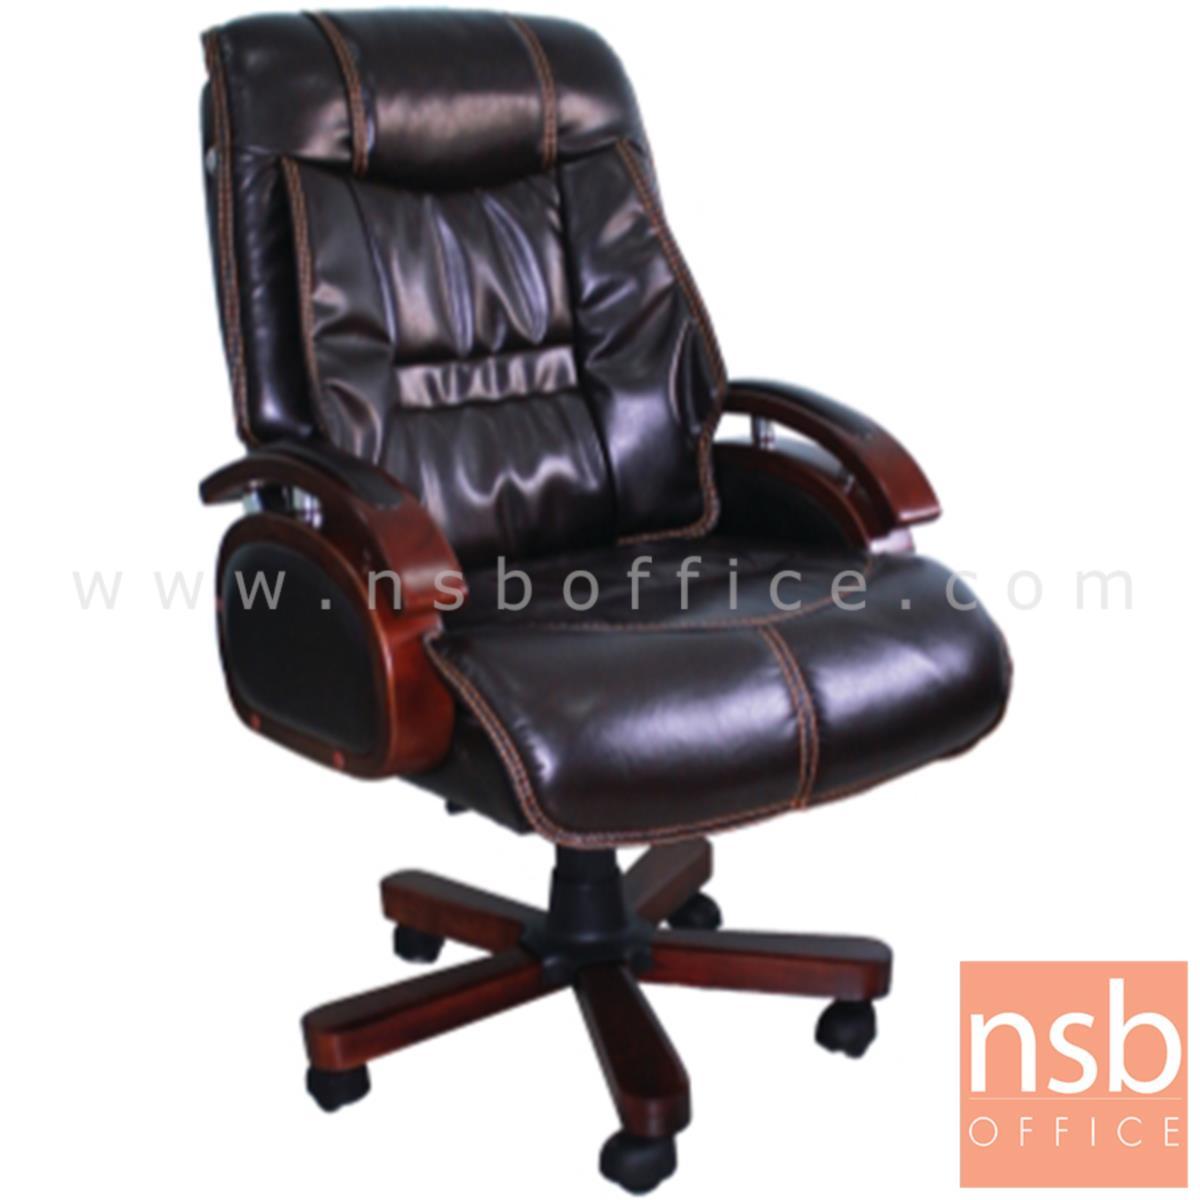 B25A053:เก้าอี้ผู้บริหารหนังแท้ รุ่น Heartstring (ฮาร์ทสตริง)  โช๊คแก๊ส ขาไม้